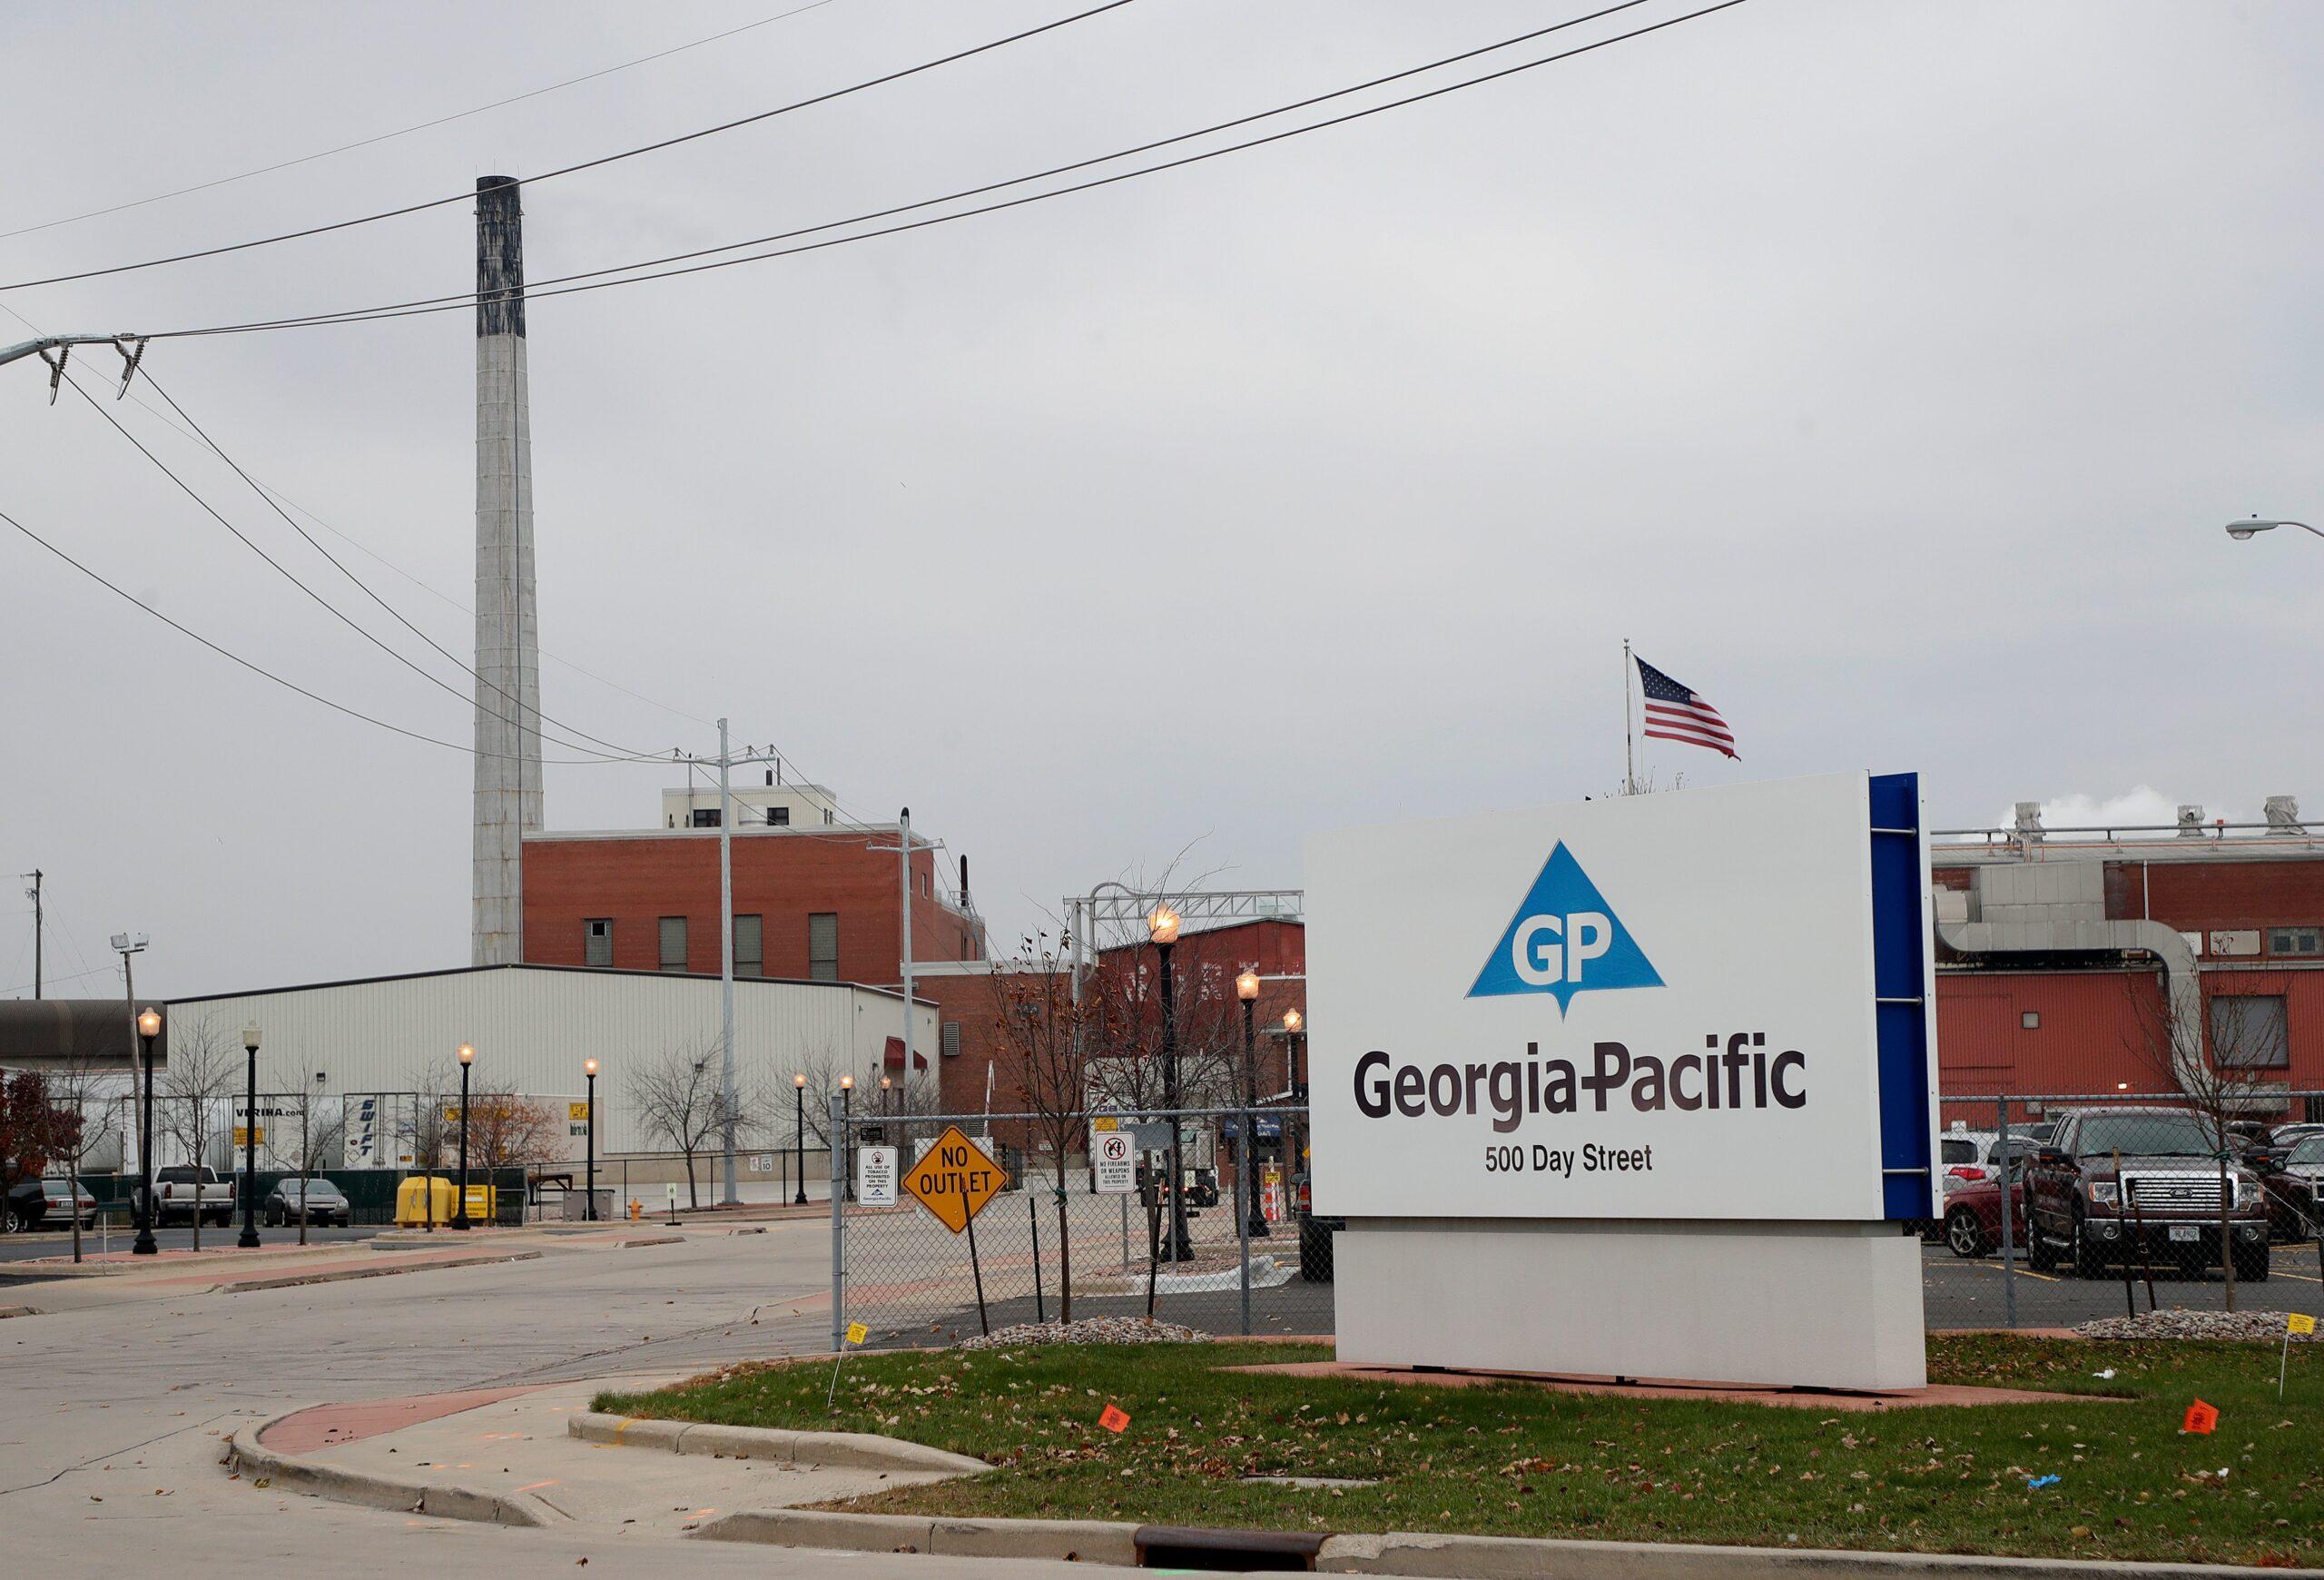 , Georgia-Pacific Announces Sale of Nonwovens Business